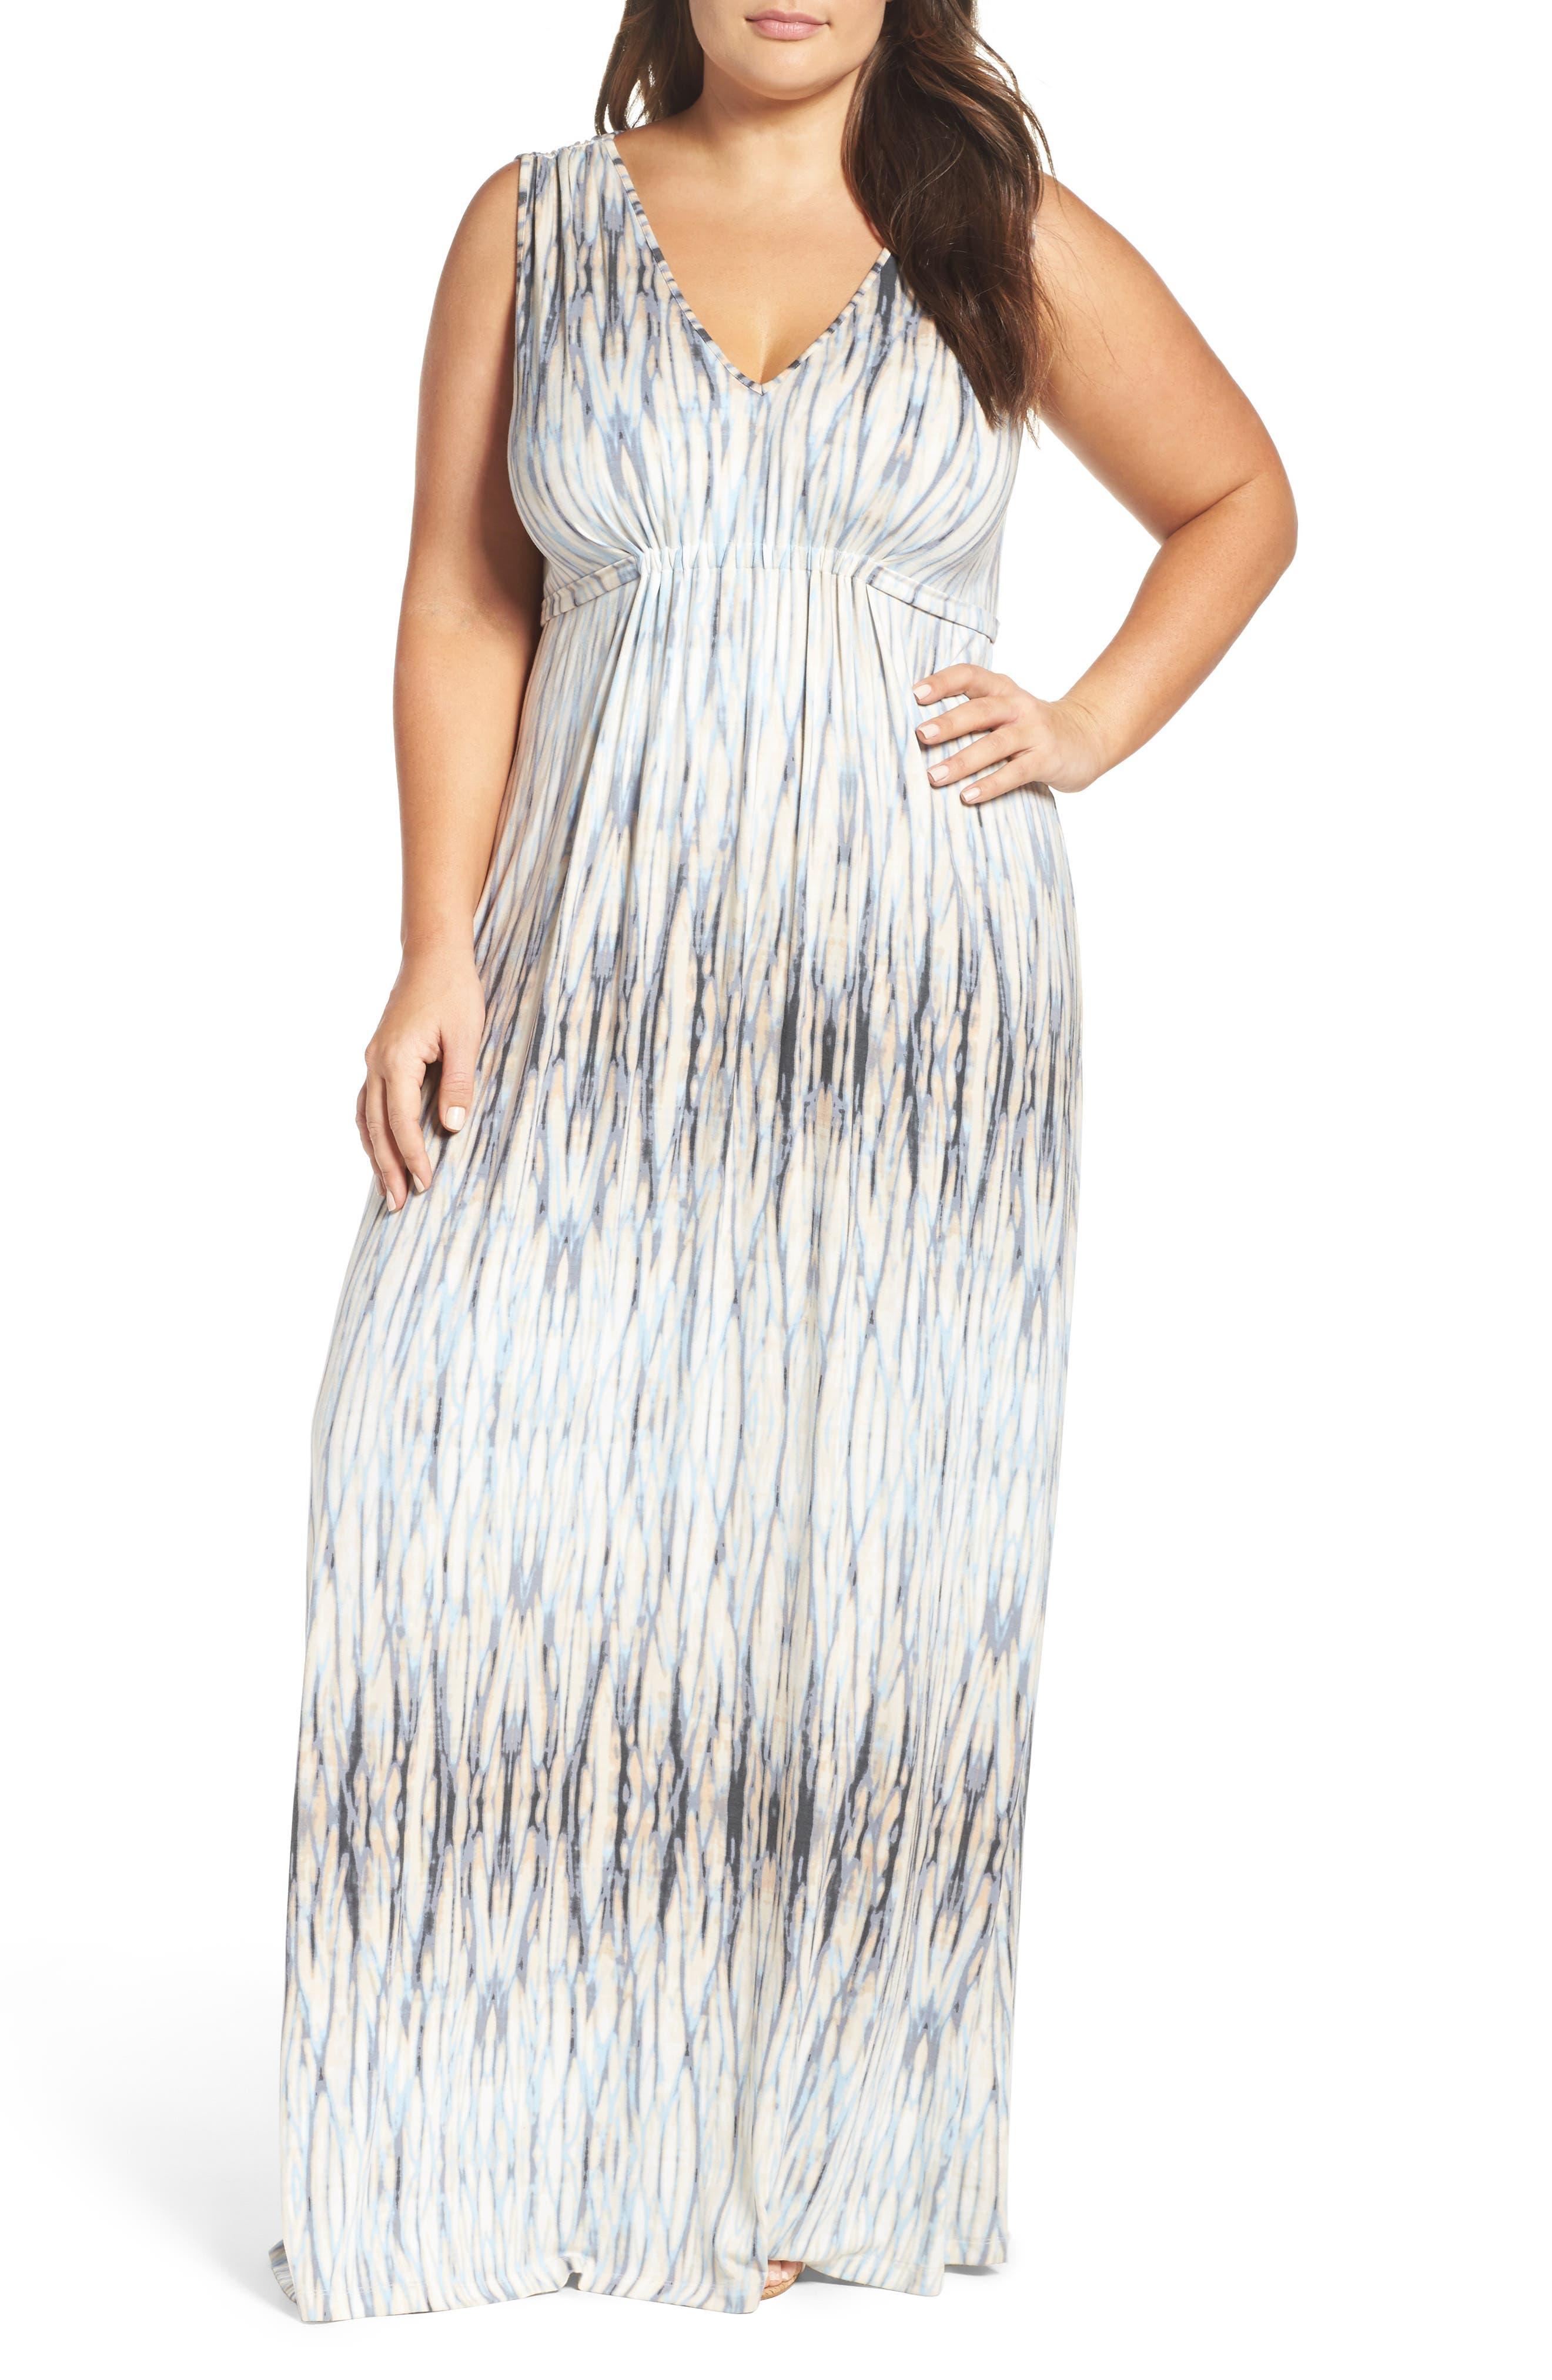 Grecia Sleeveless Jersey Maxi Dress,                             Main thumbnail 1, color,                             Water Reflections